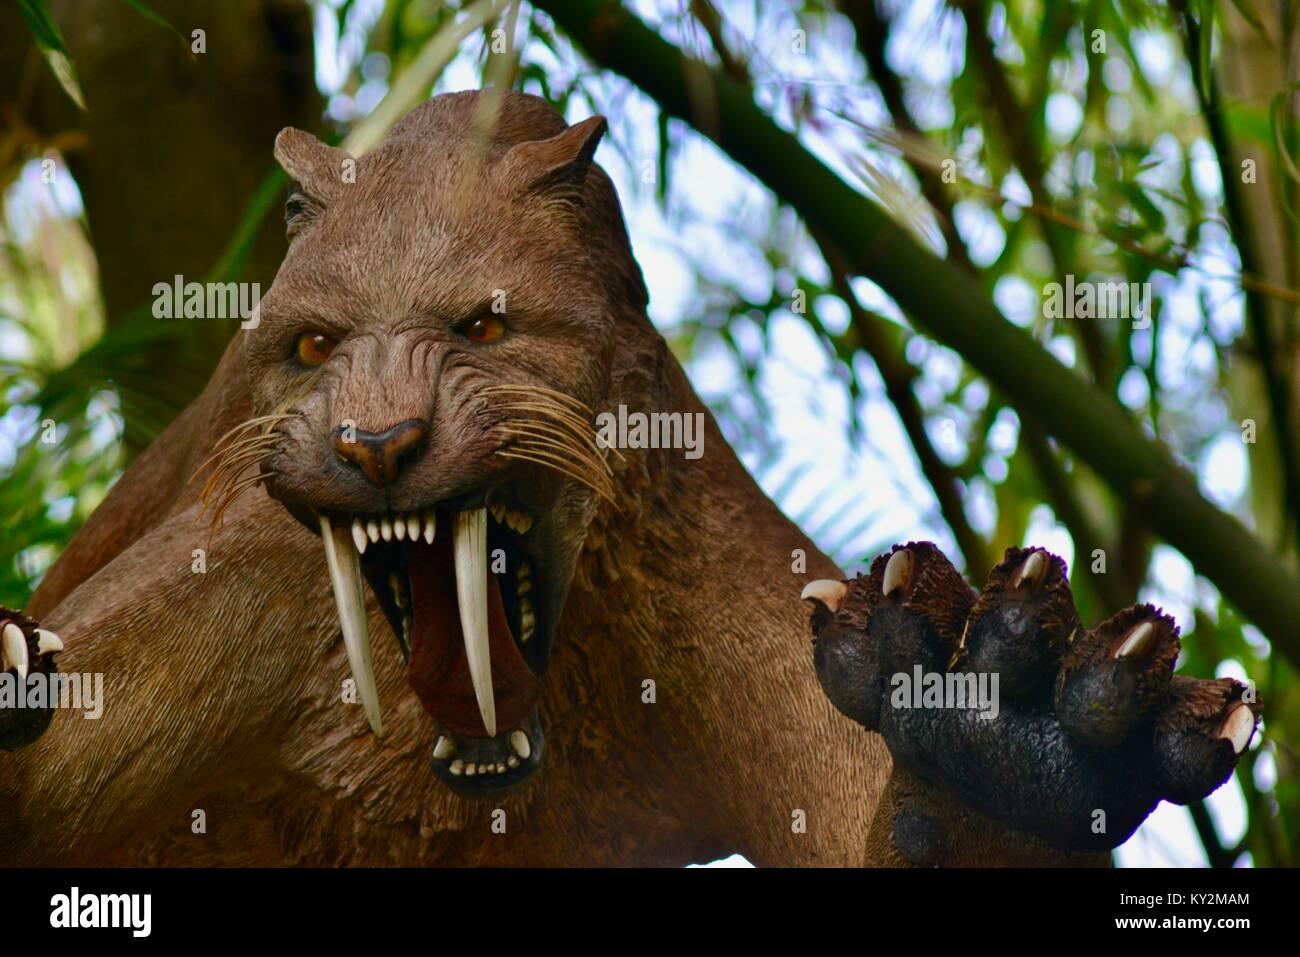 Sabre toothed tiger snarling, Australia Zoo, Beerwah, Queensland, Australia - Stock Image